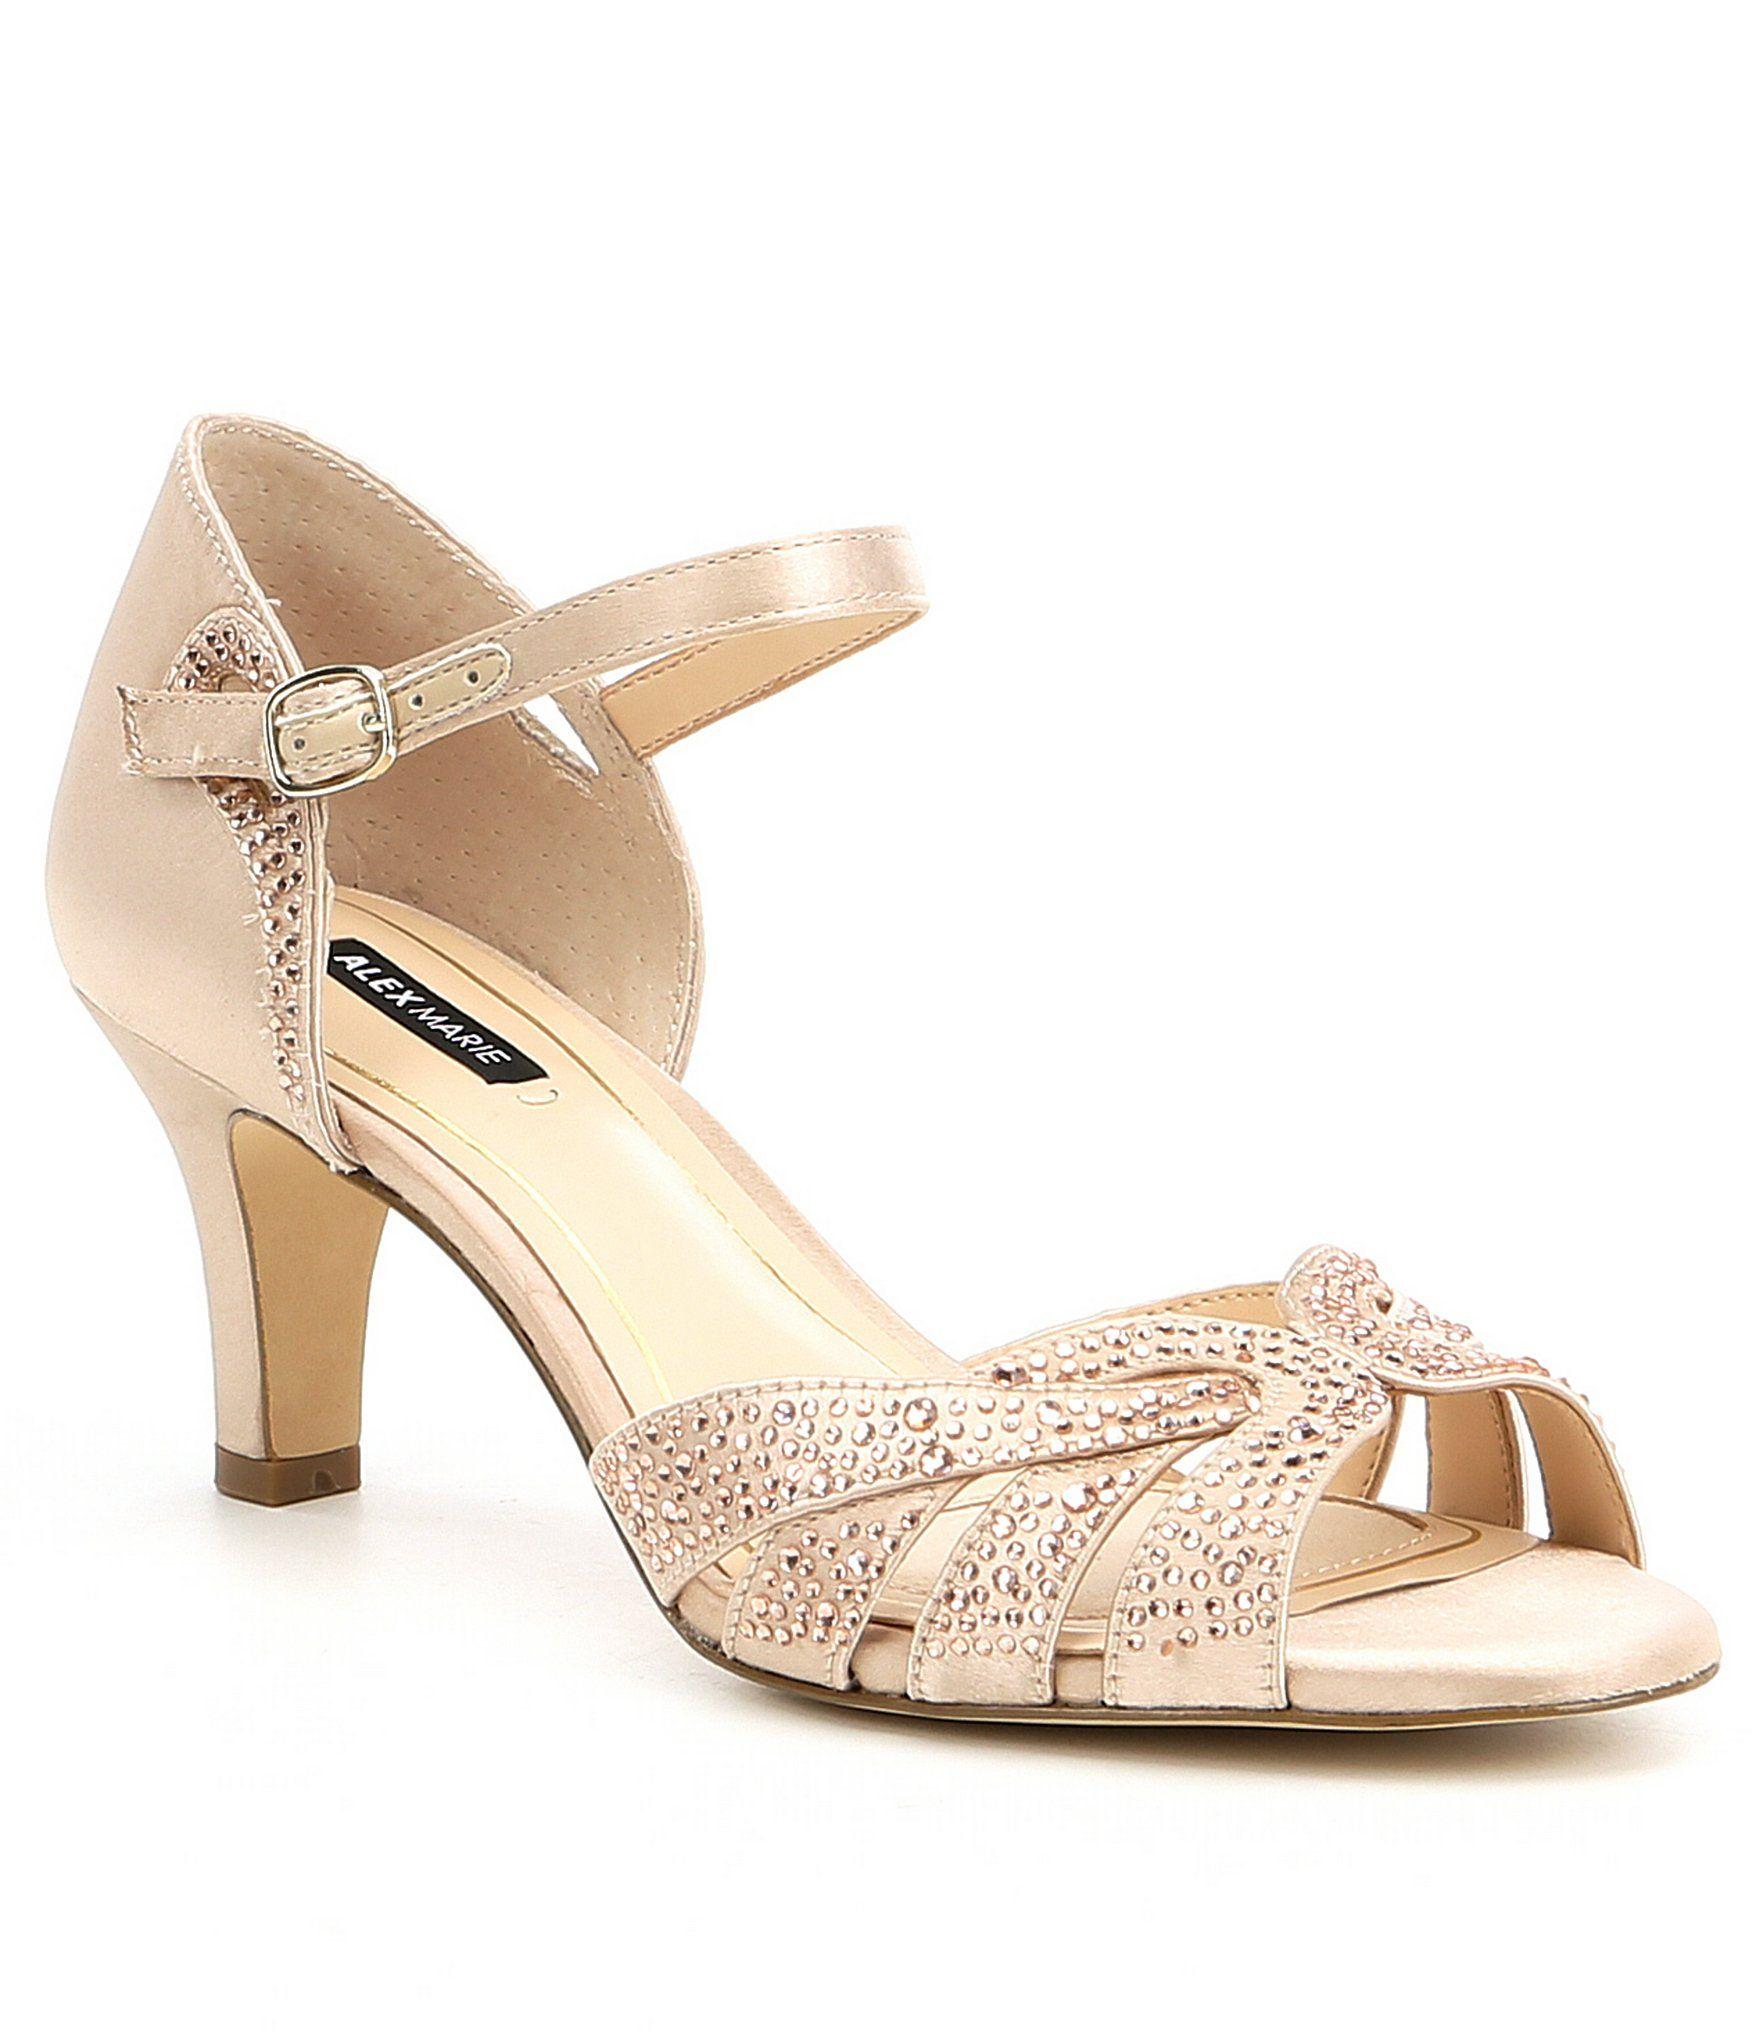 e175ee999f2b Alex Marie Layona Jeweled Satin Dress Sandals 8FpdeG - alikeplaces.com